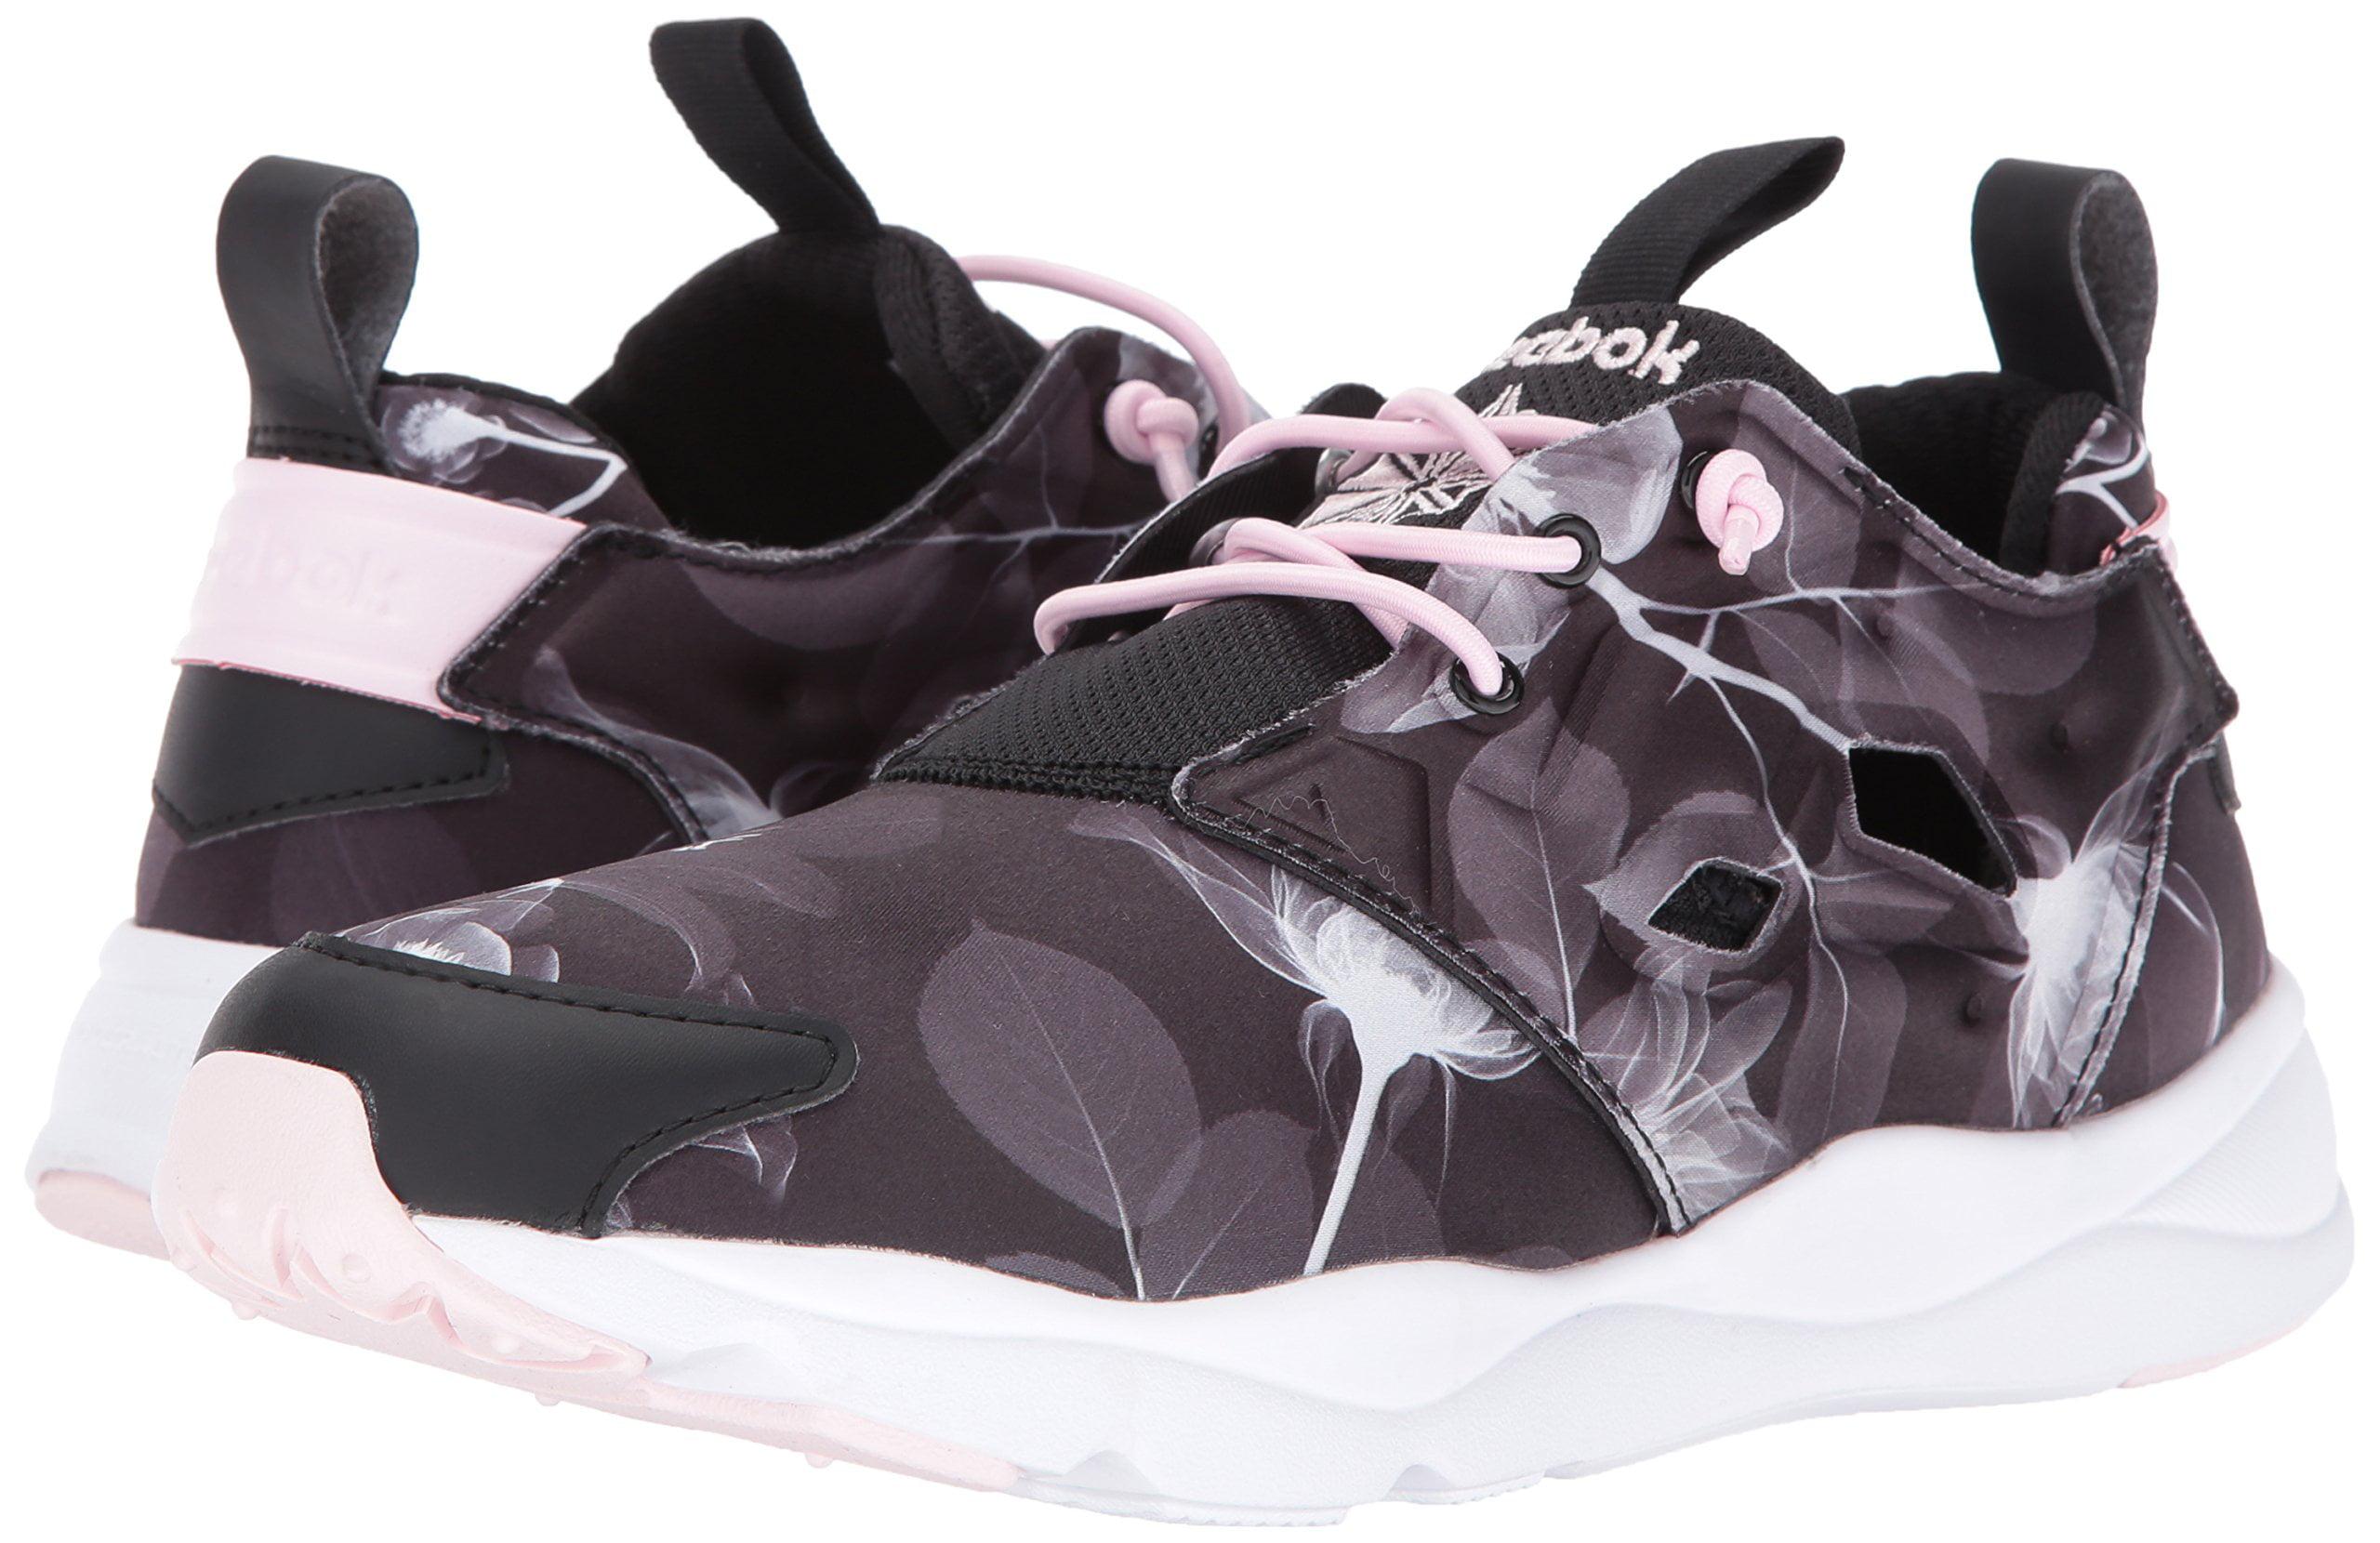 super popular c6096 4759e Reebok - Reebok AQ9836  Women s Furylite Graphic Fashion Sneaker, Floral  Black White - Walmart.com